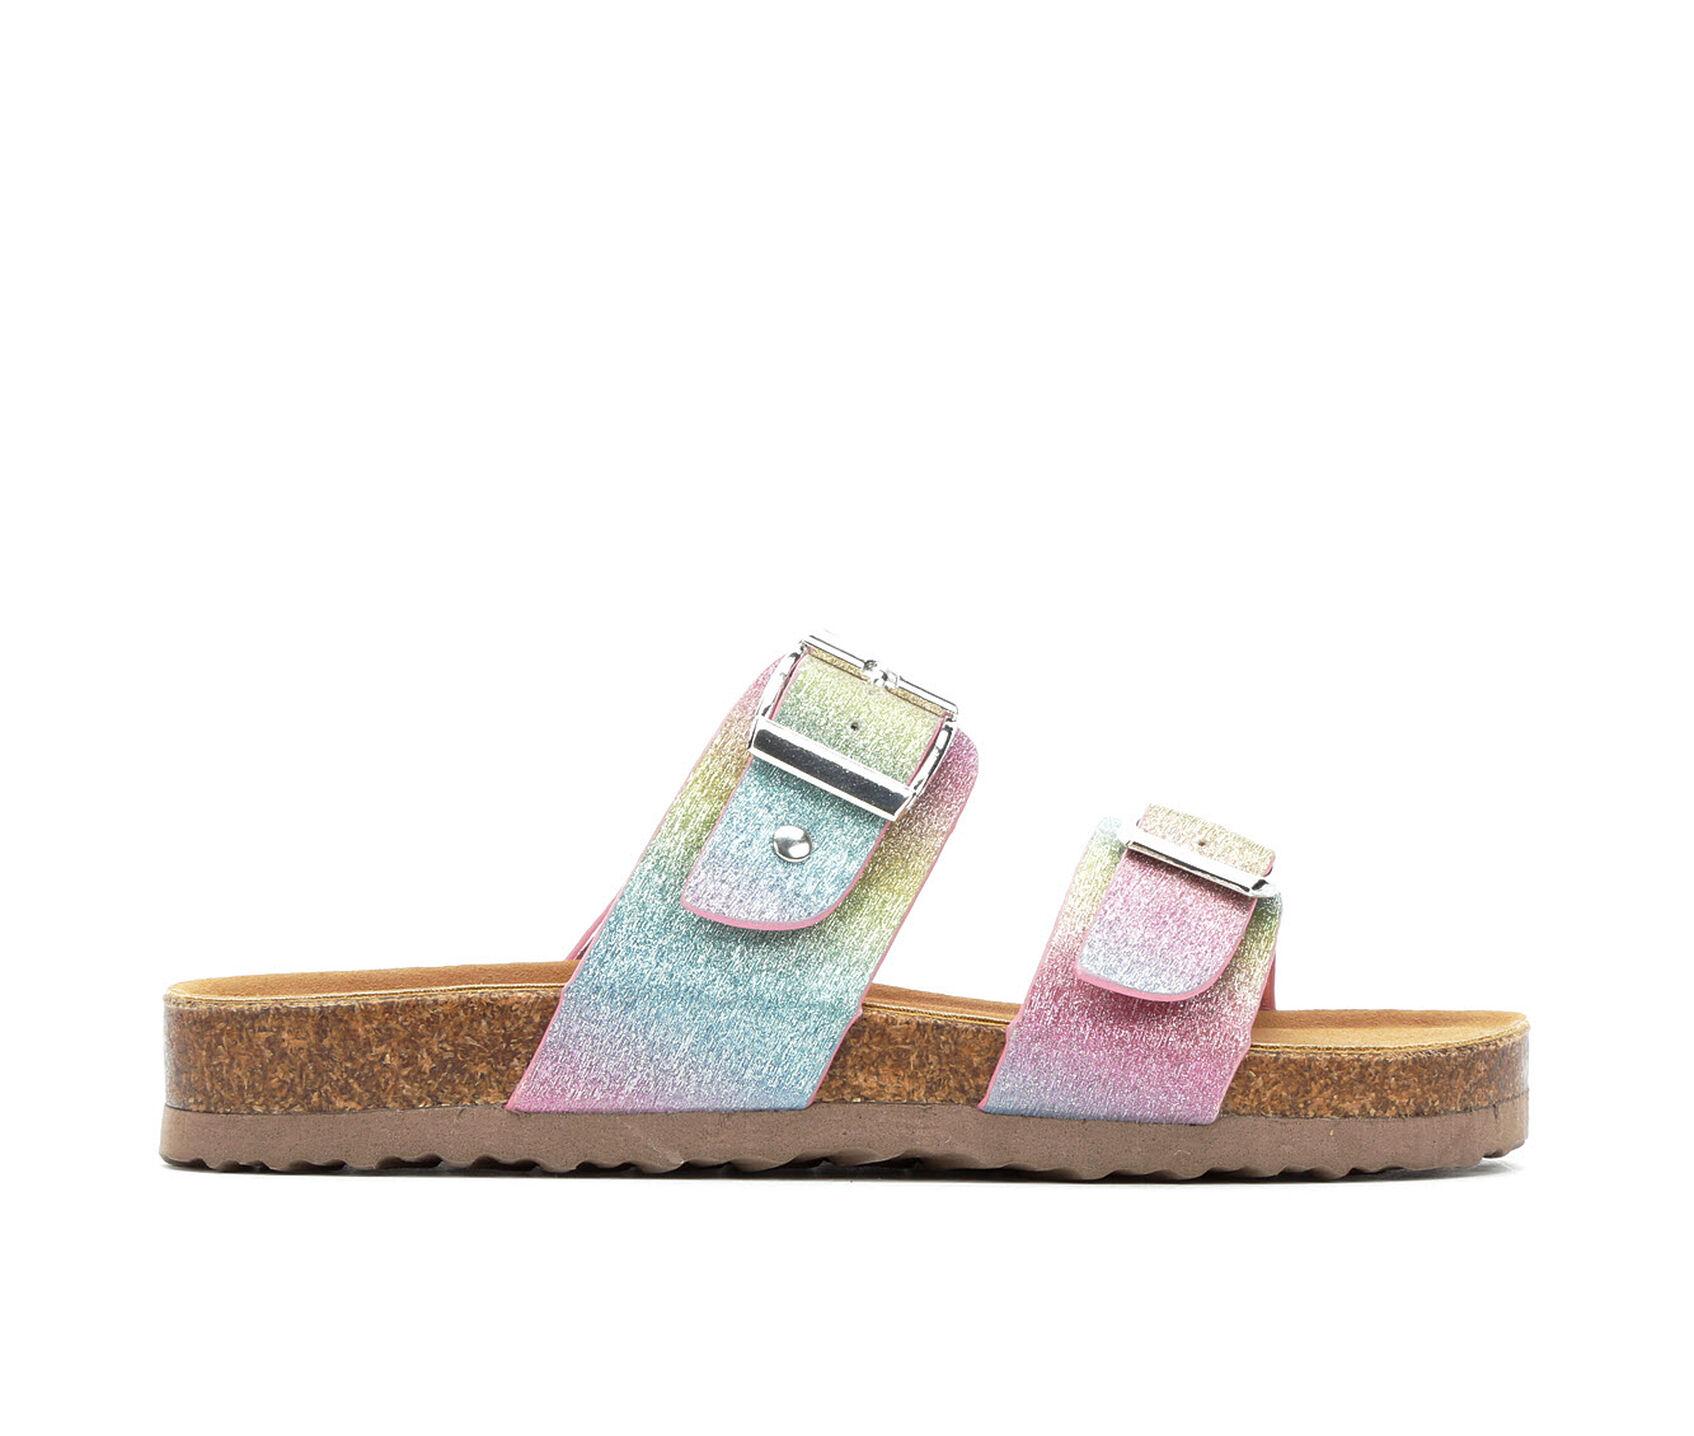 6beafac55e1 Girls' Madden Girl Little Kid & Big Kid Brando Sandals